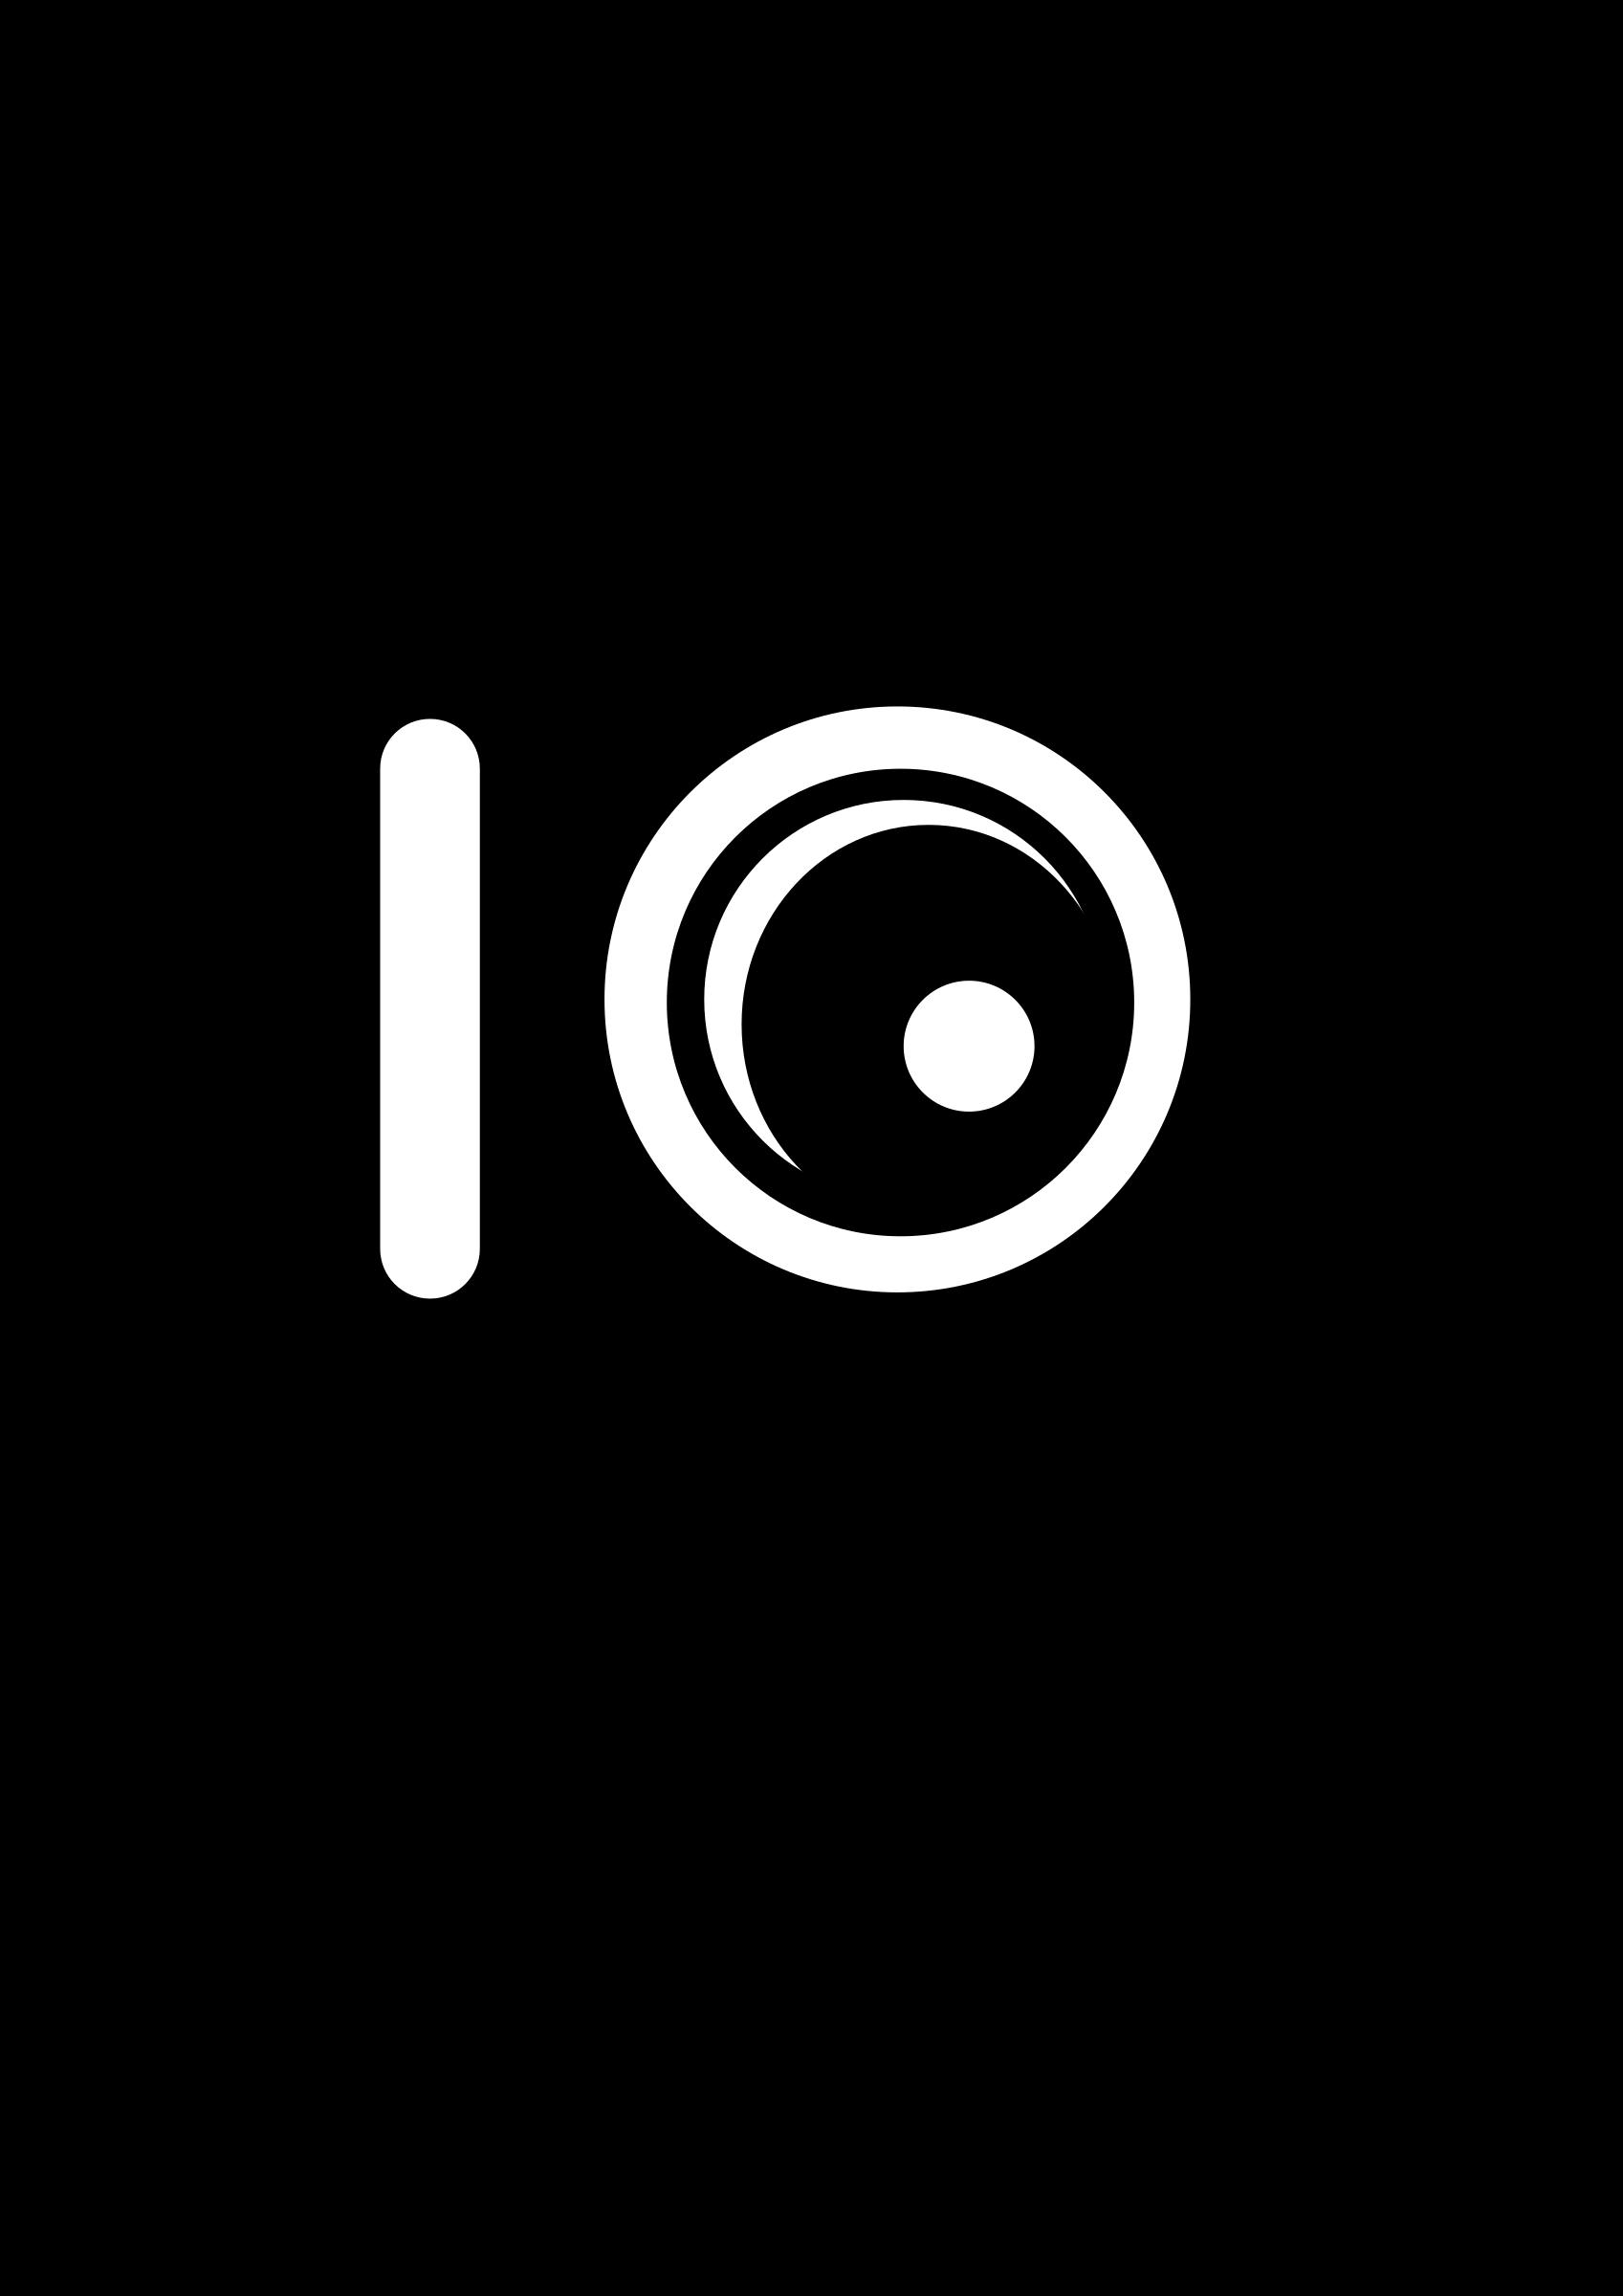 Logo clipart camera. Big image png